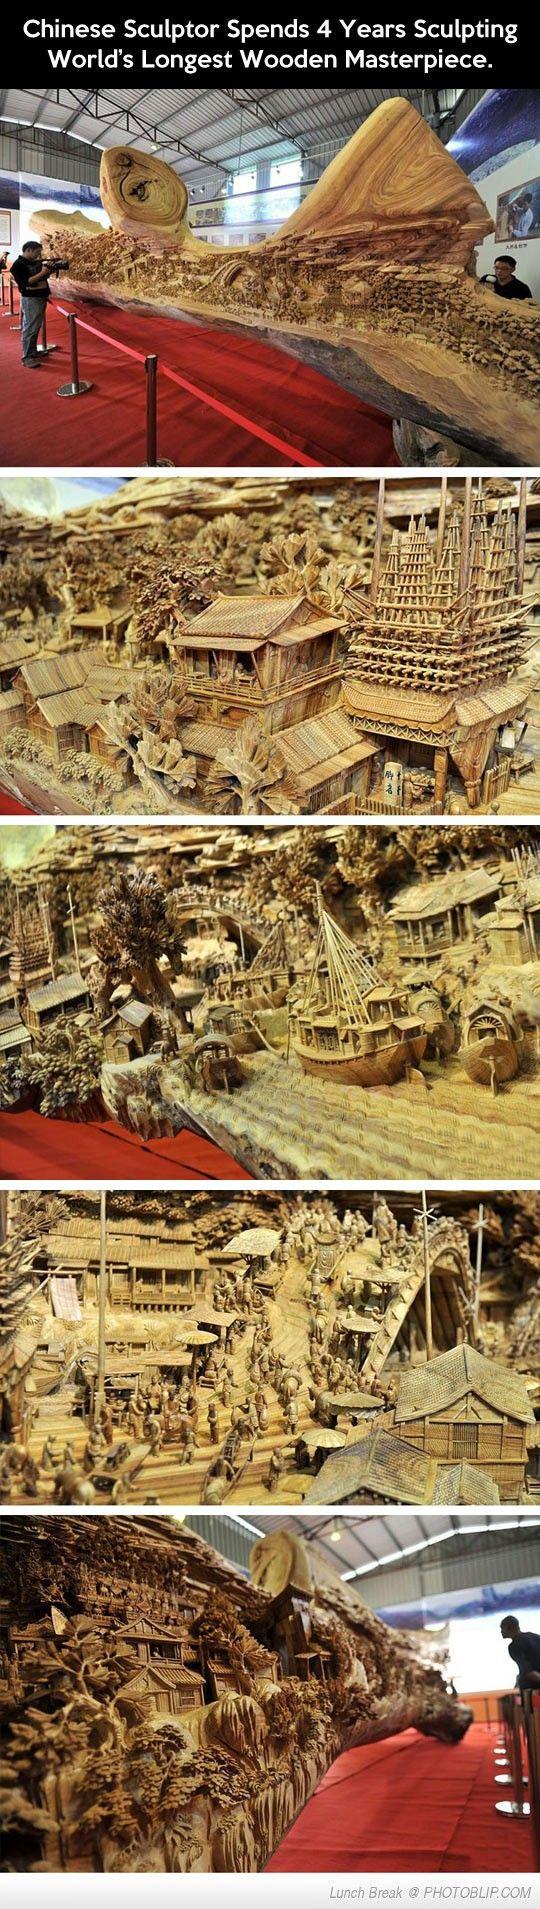 World's Longest Wooden Masterpiece